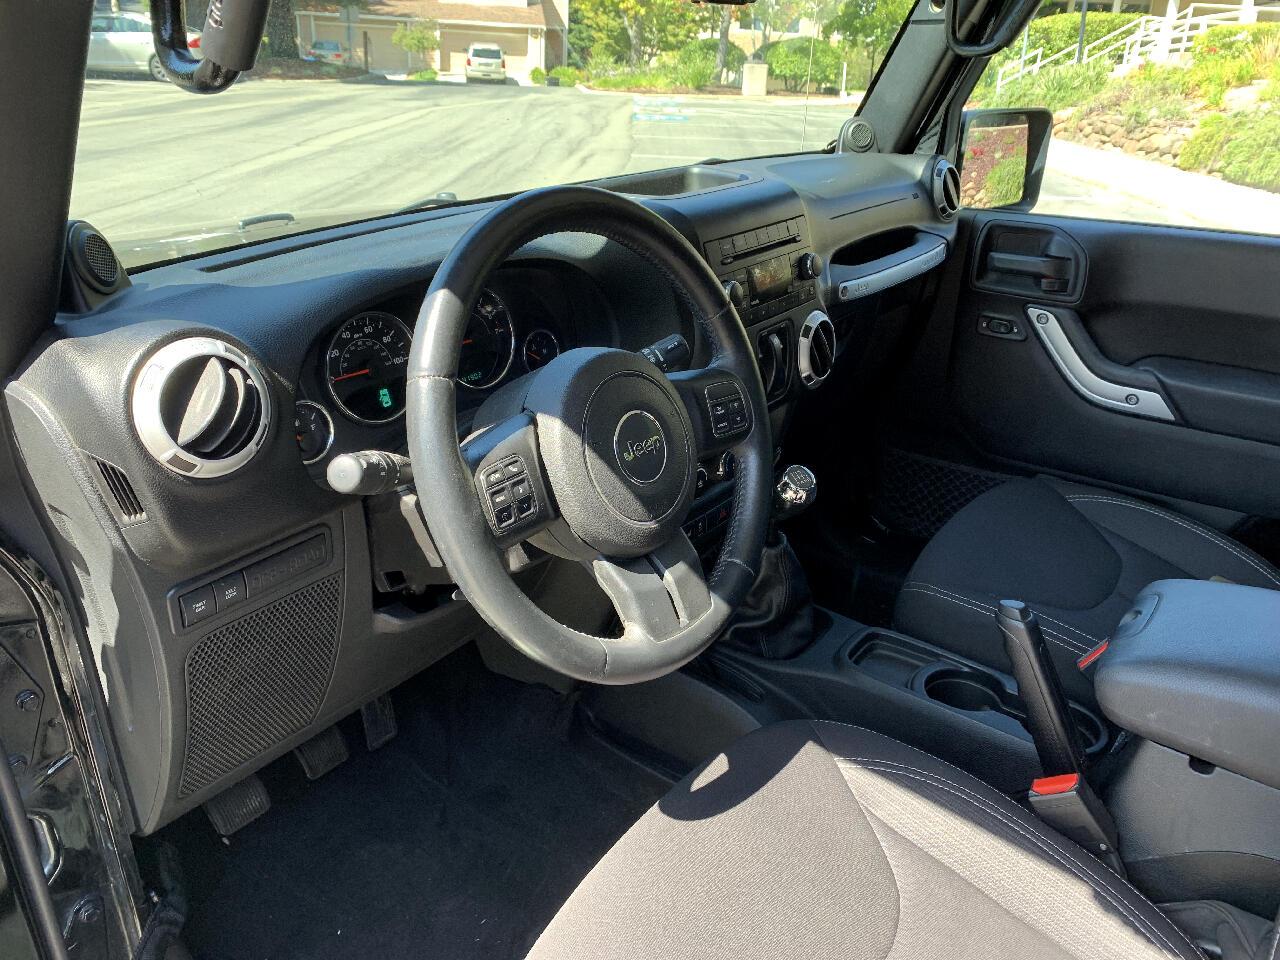 2014 Jeep Wrangler Rubicon 4WD